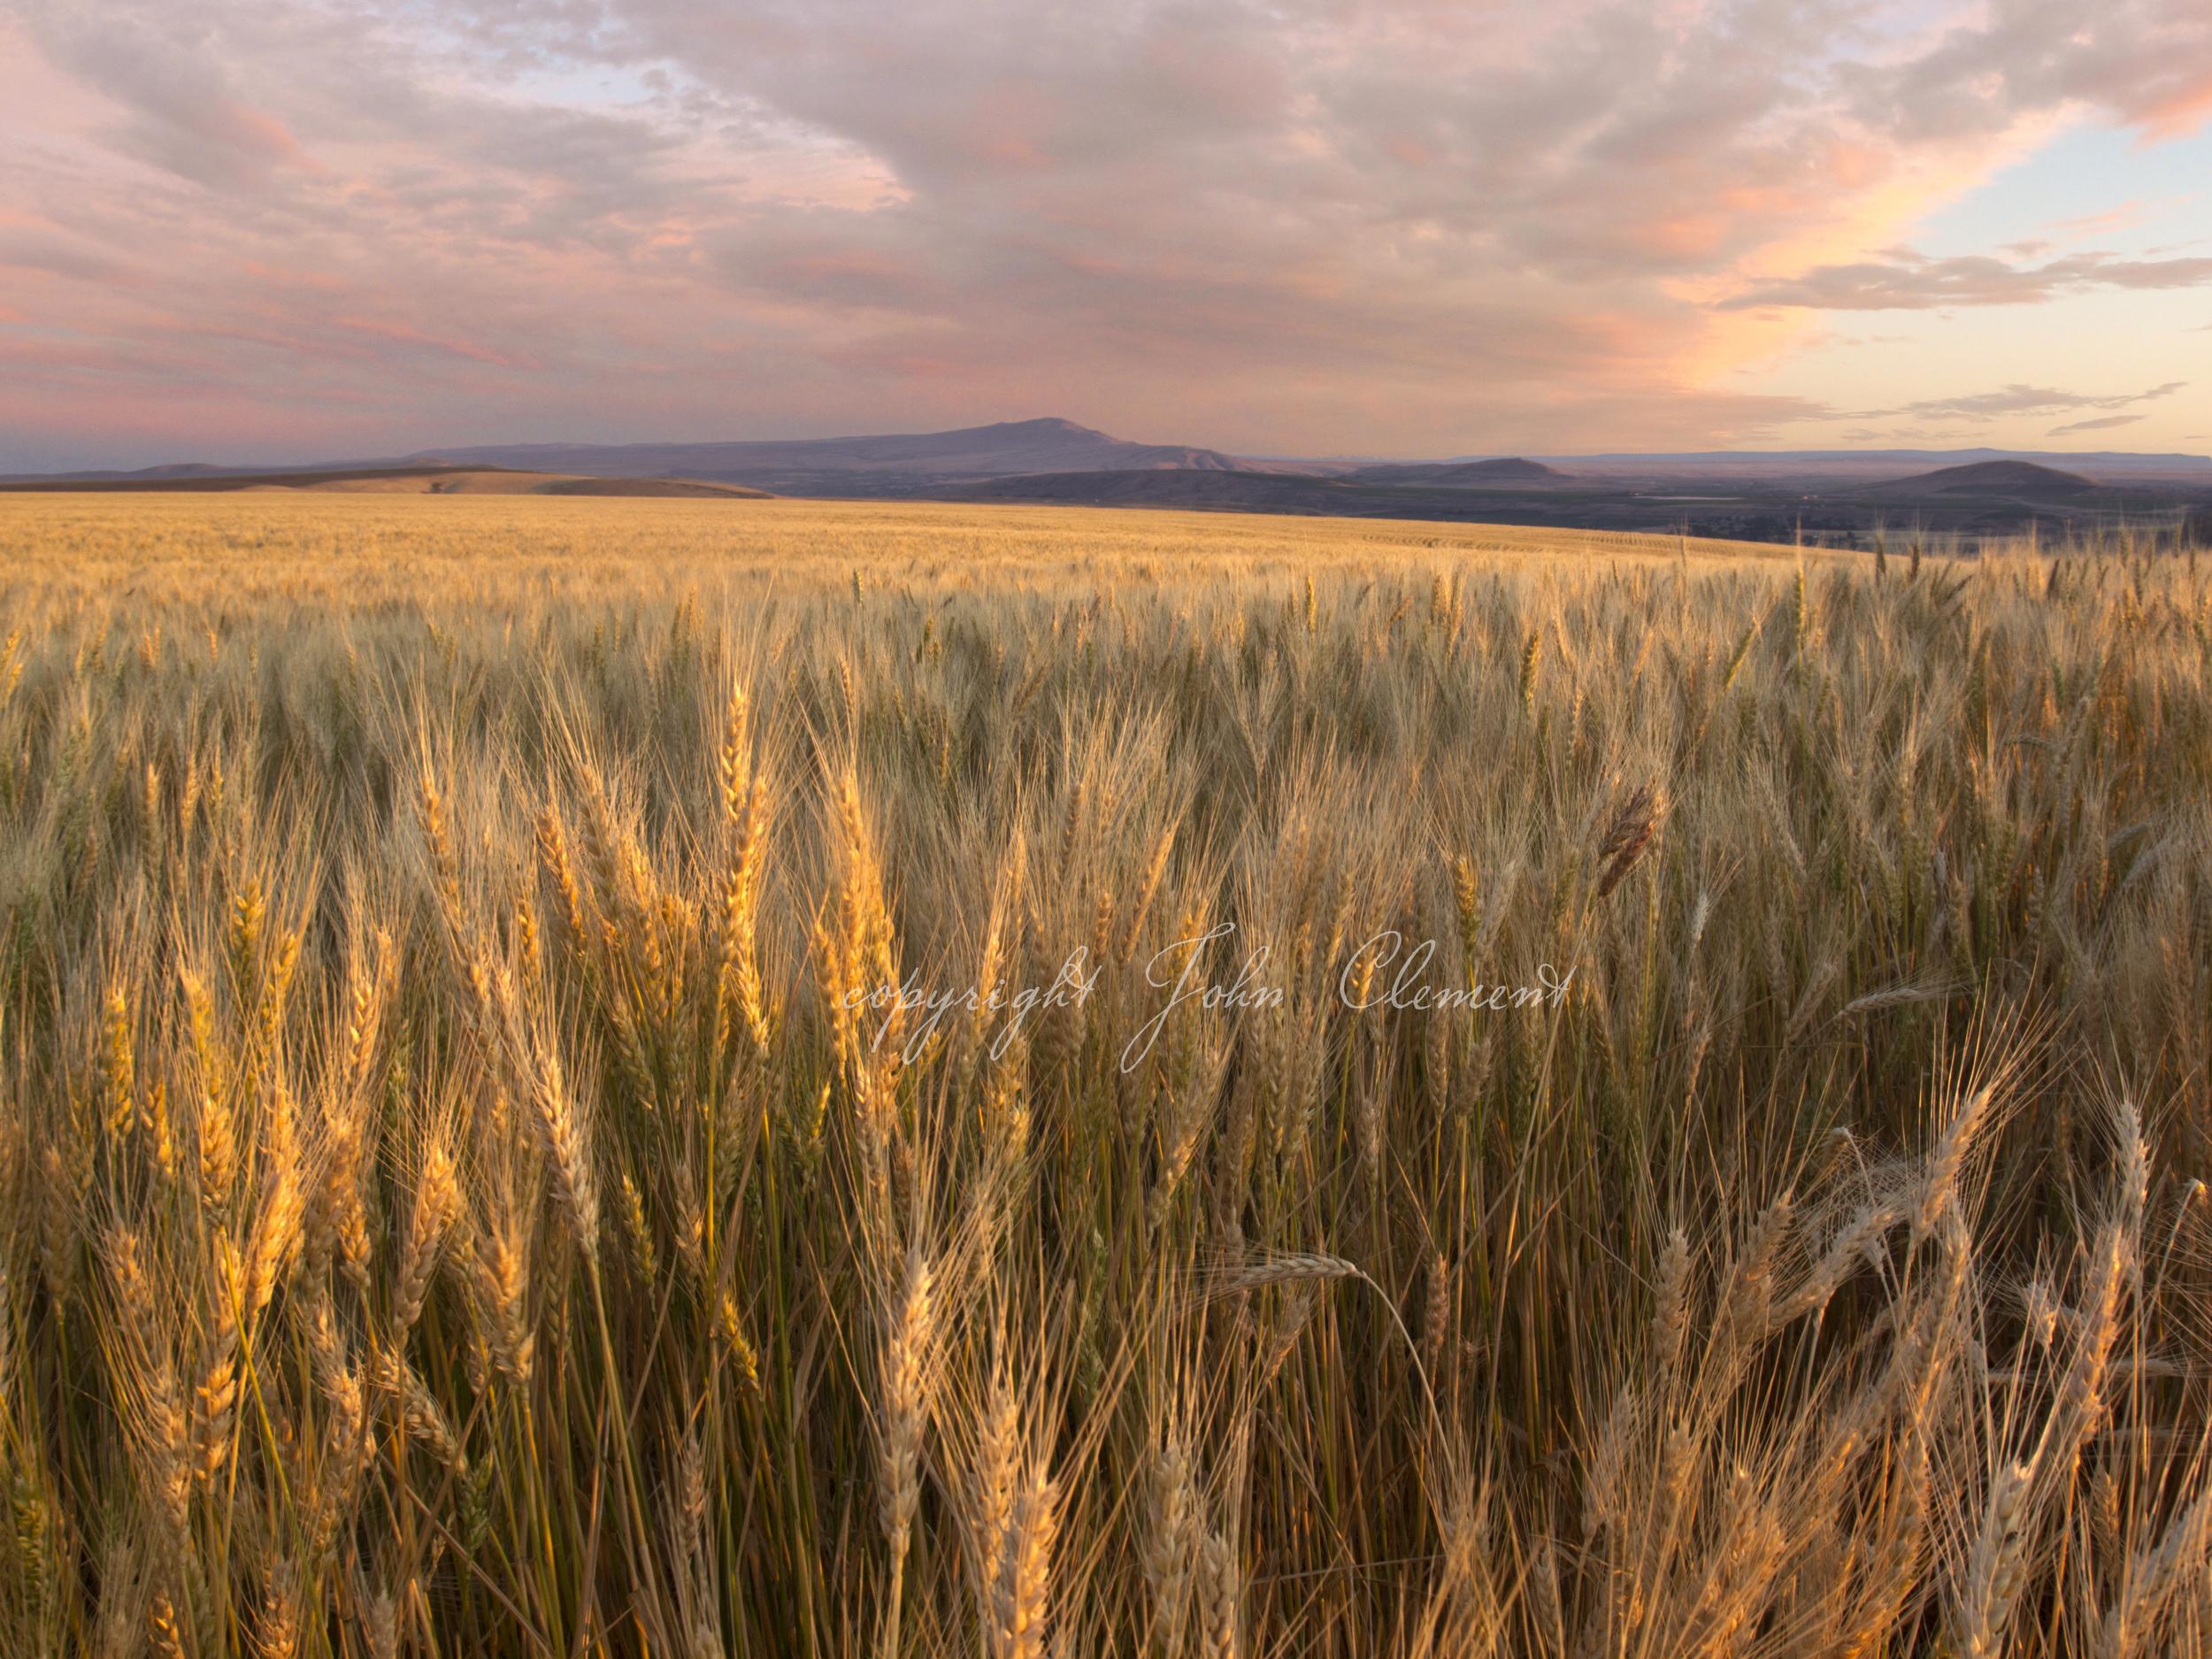 Wheat and Rattlesnake Mountain